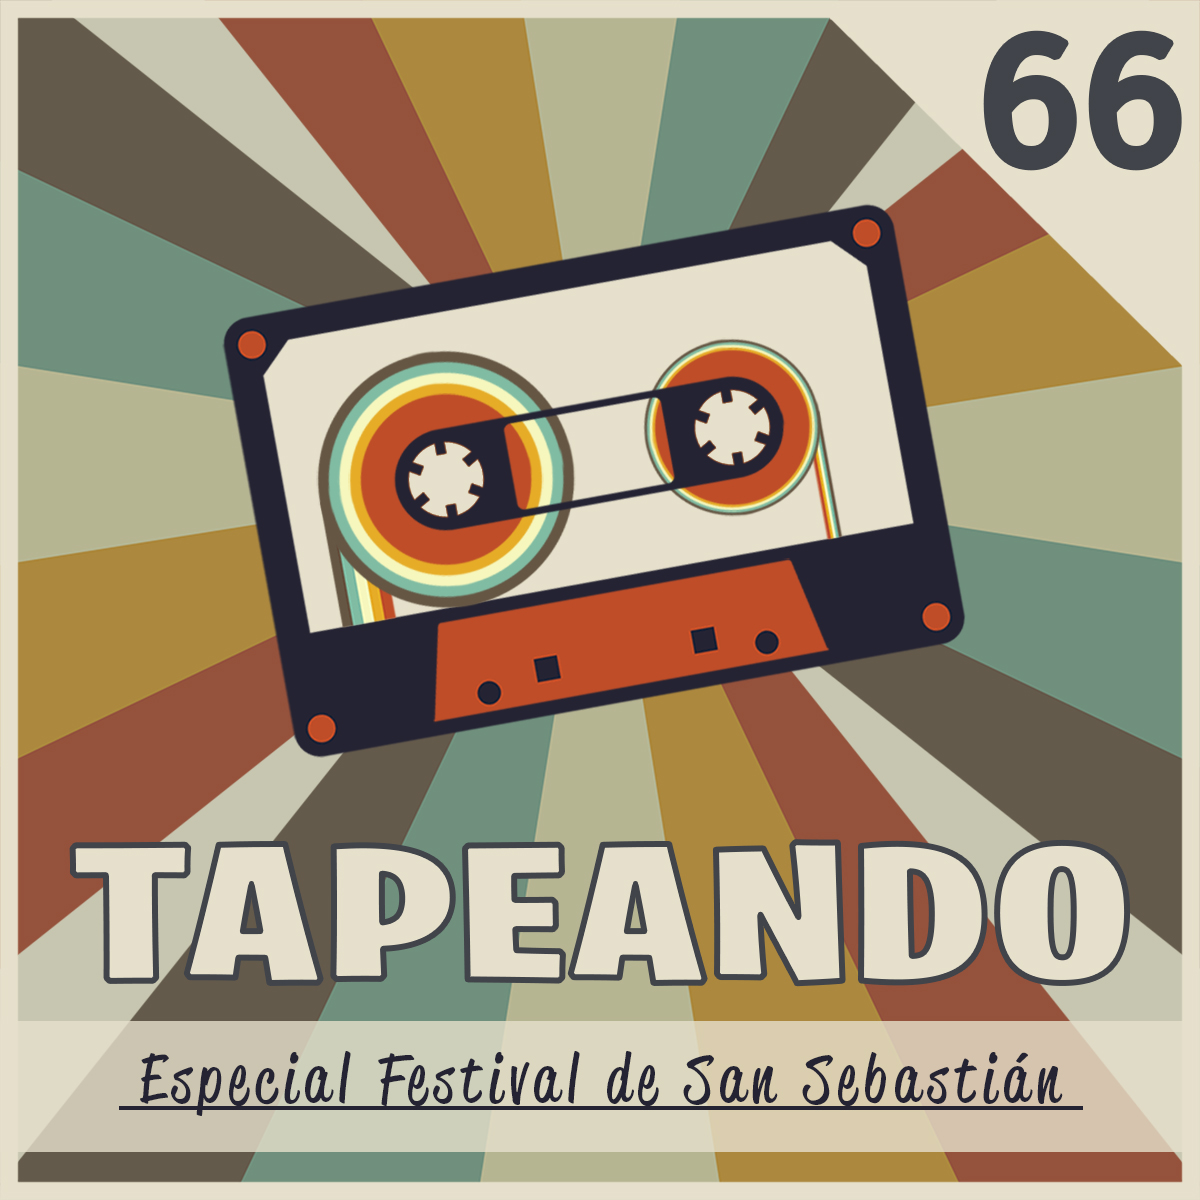 Tapeando, TapeandoRadio, Tapeando Radio, Festival de Cine de San Sebastián, 67SSIFF, Podcast